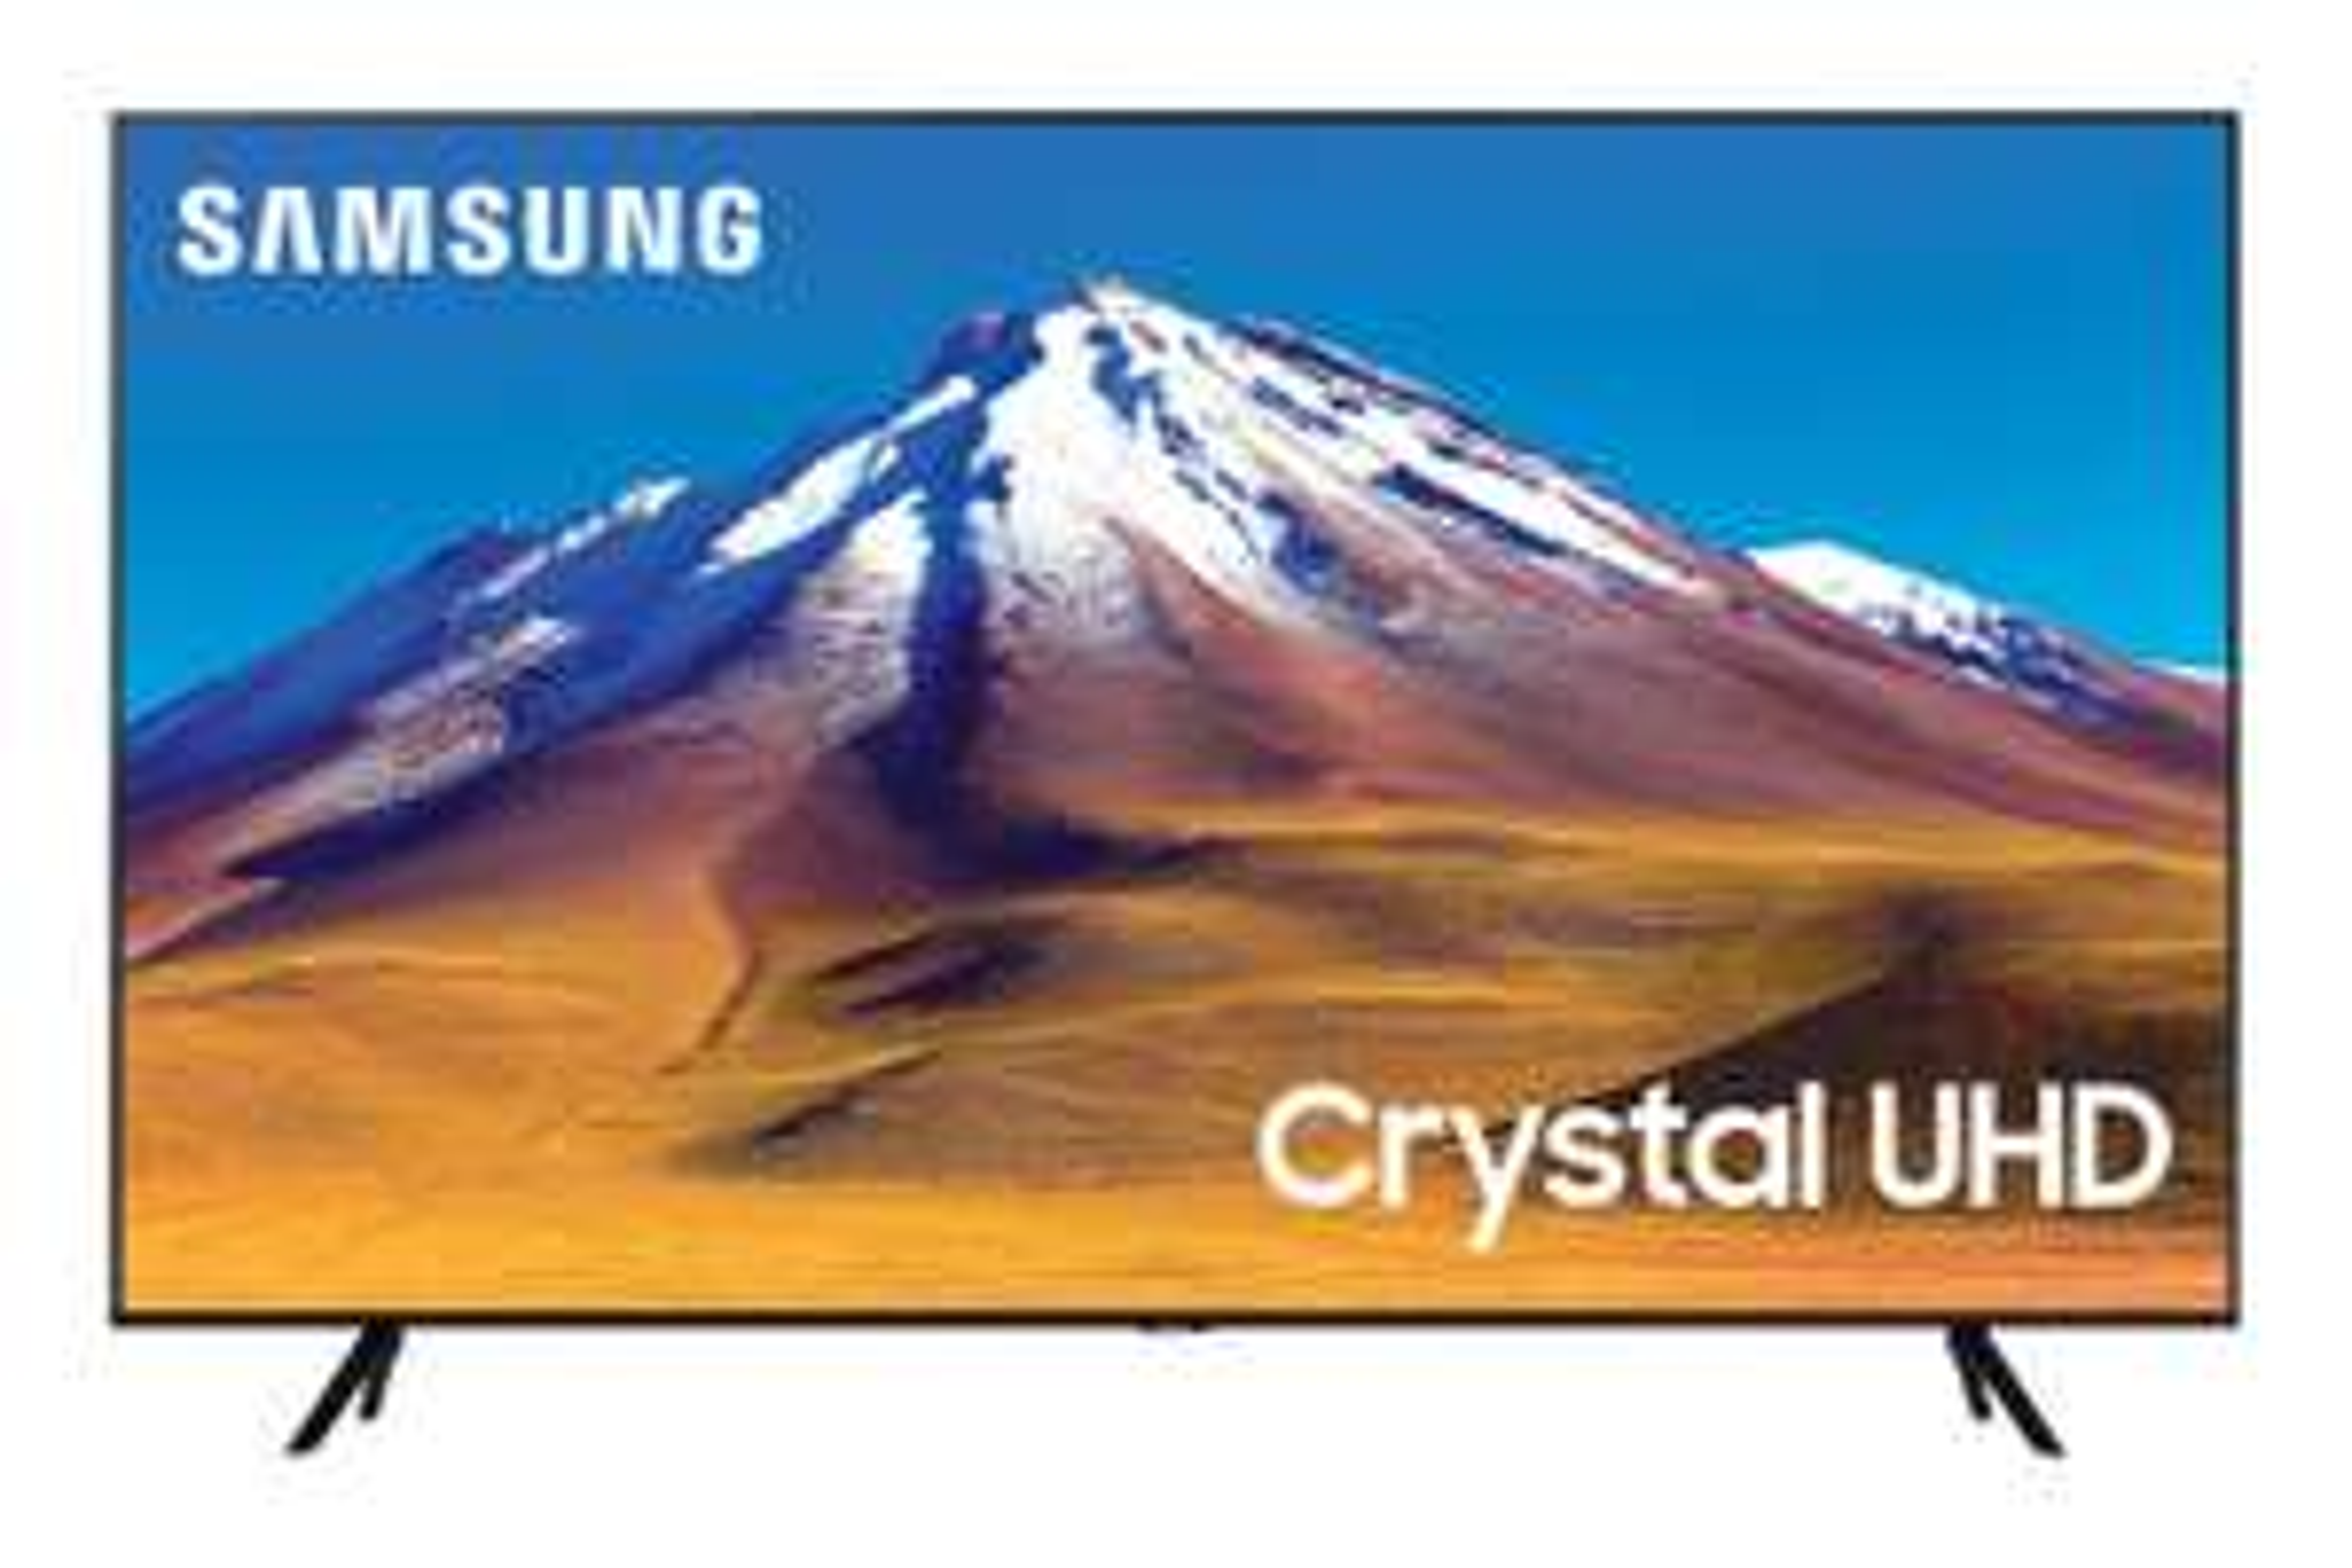 Samsung Led Tv 70 inch.